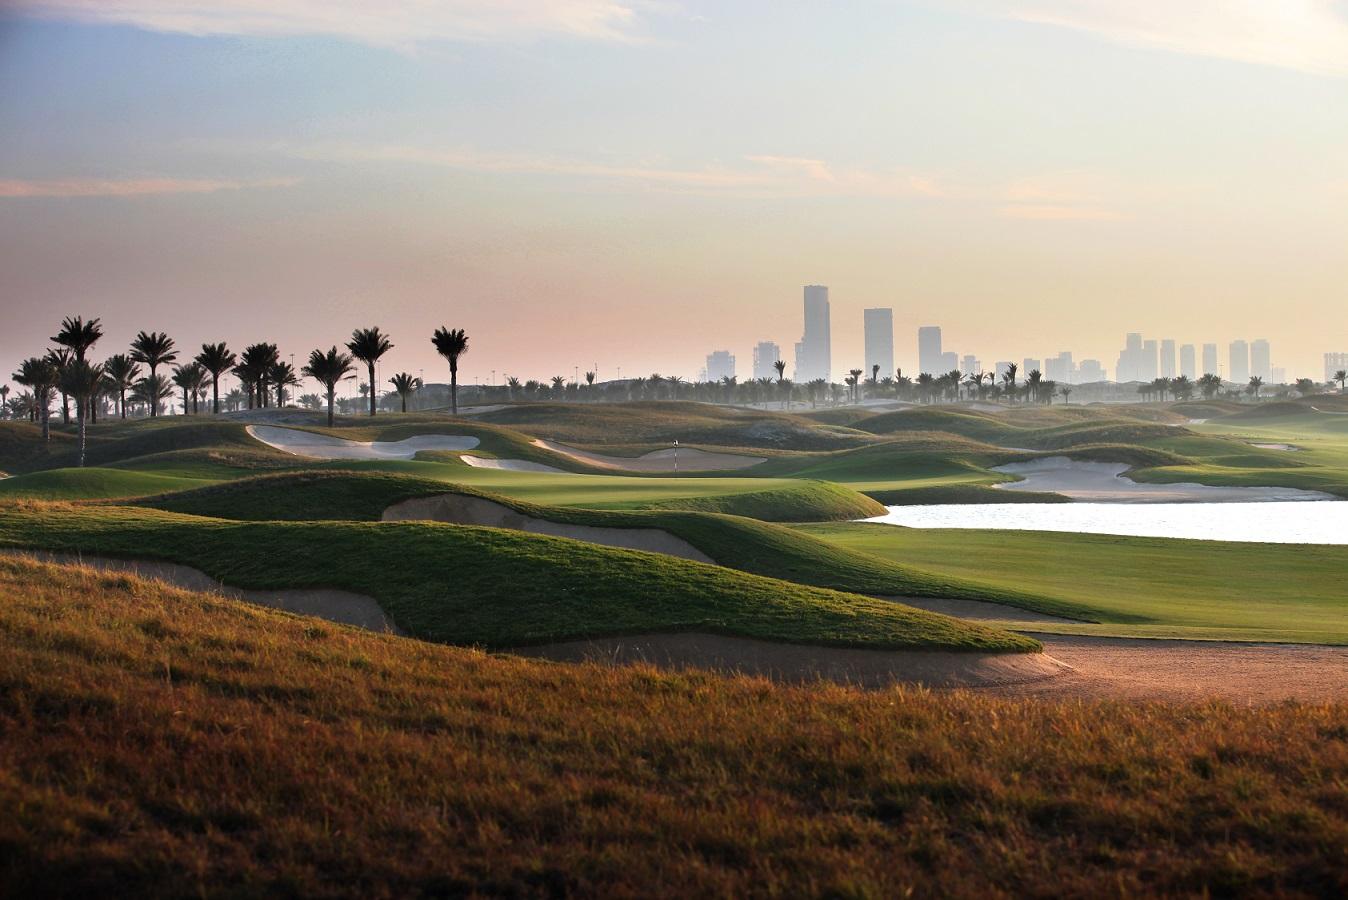 Abu Dhabi Saadiyat Beach Golf Club